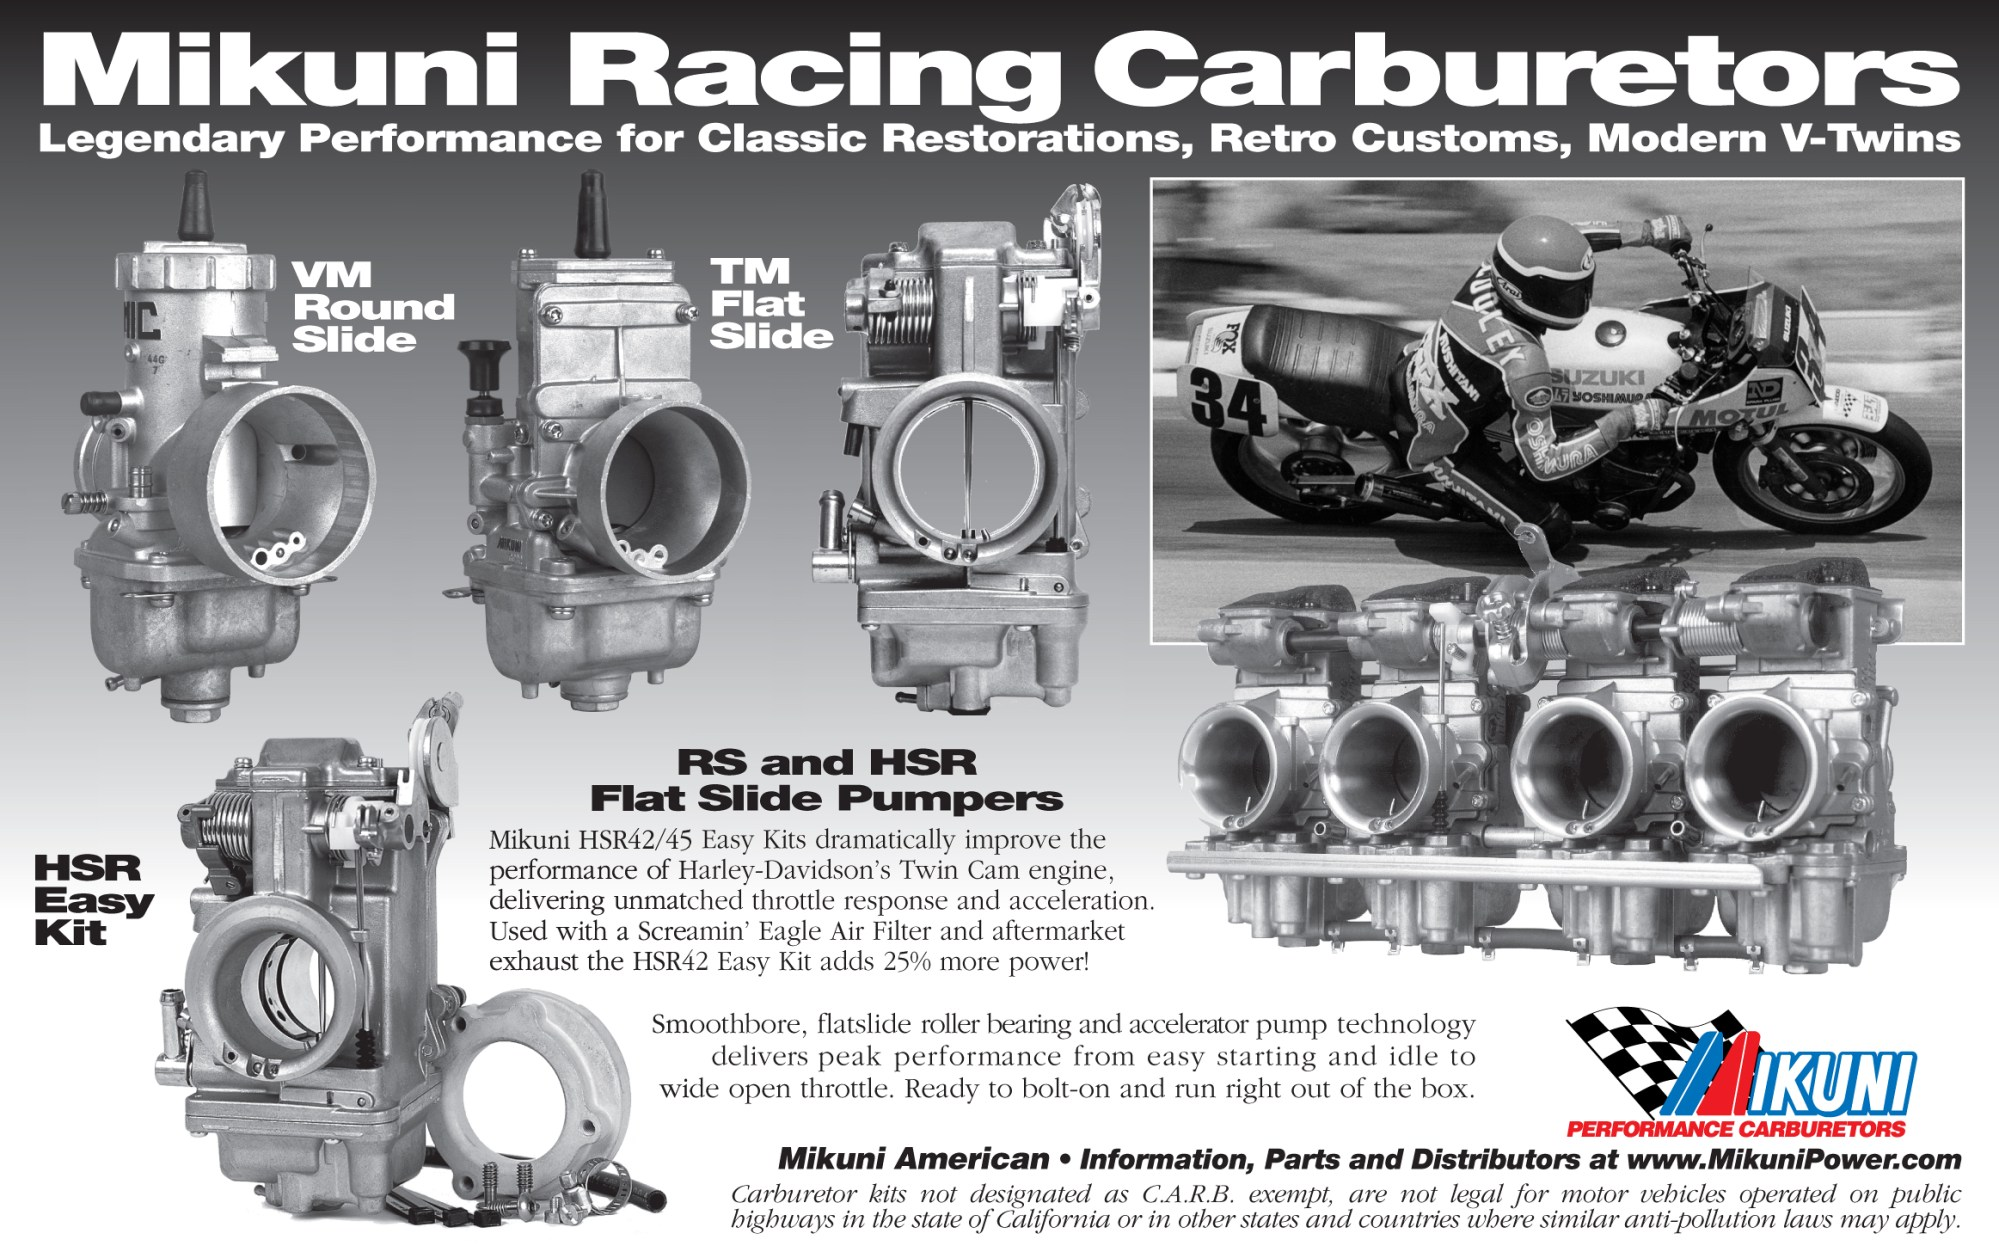 hight resolution of mikuni logos hi resolution 300dpi mikuni performance carburetors 300dp rgb logo in jpg format